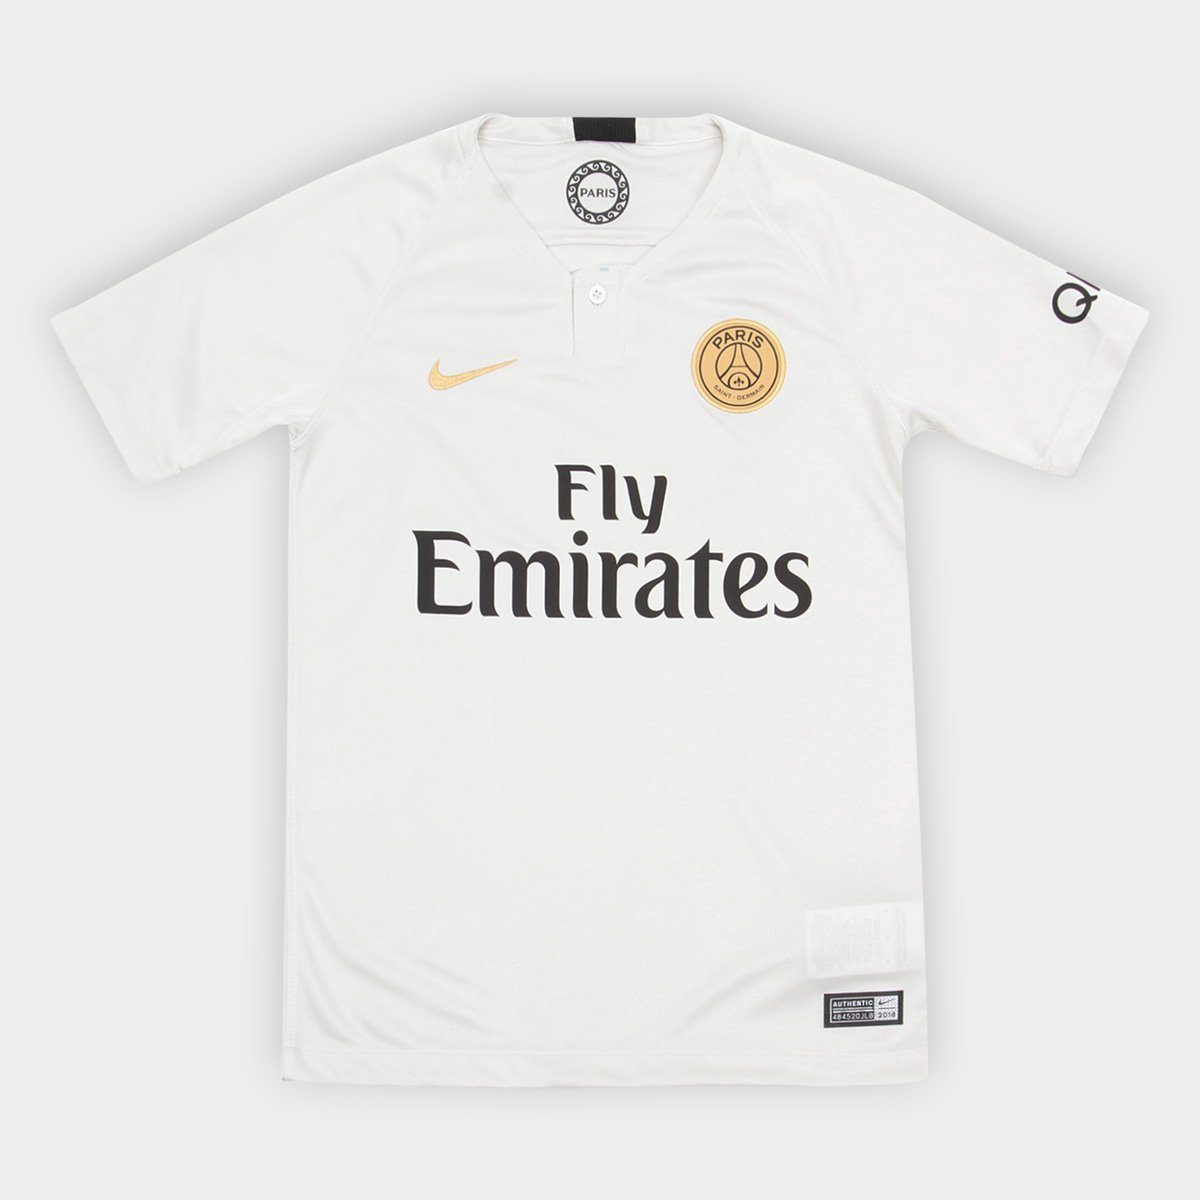 cc646fa89a Camisa Paris Saint-Germain Infantil Away 2018 s/n° - Torcedor Nike - Off  White | Allianz Parque Shop